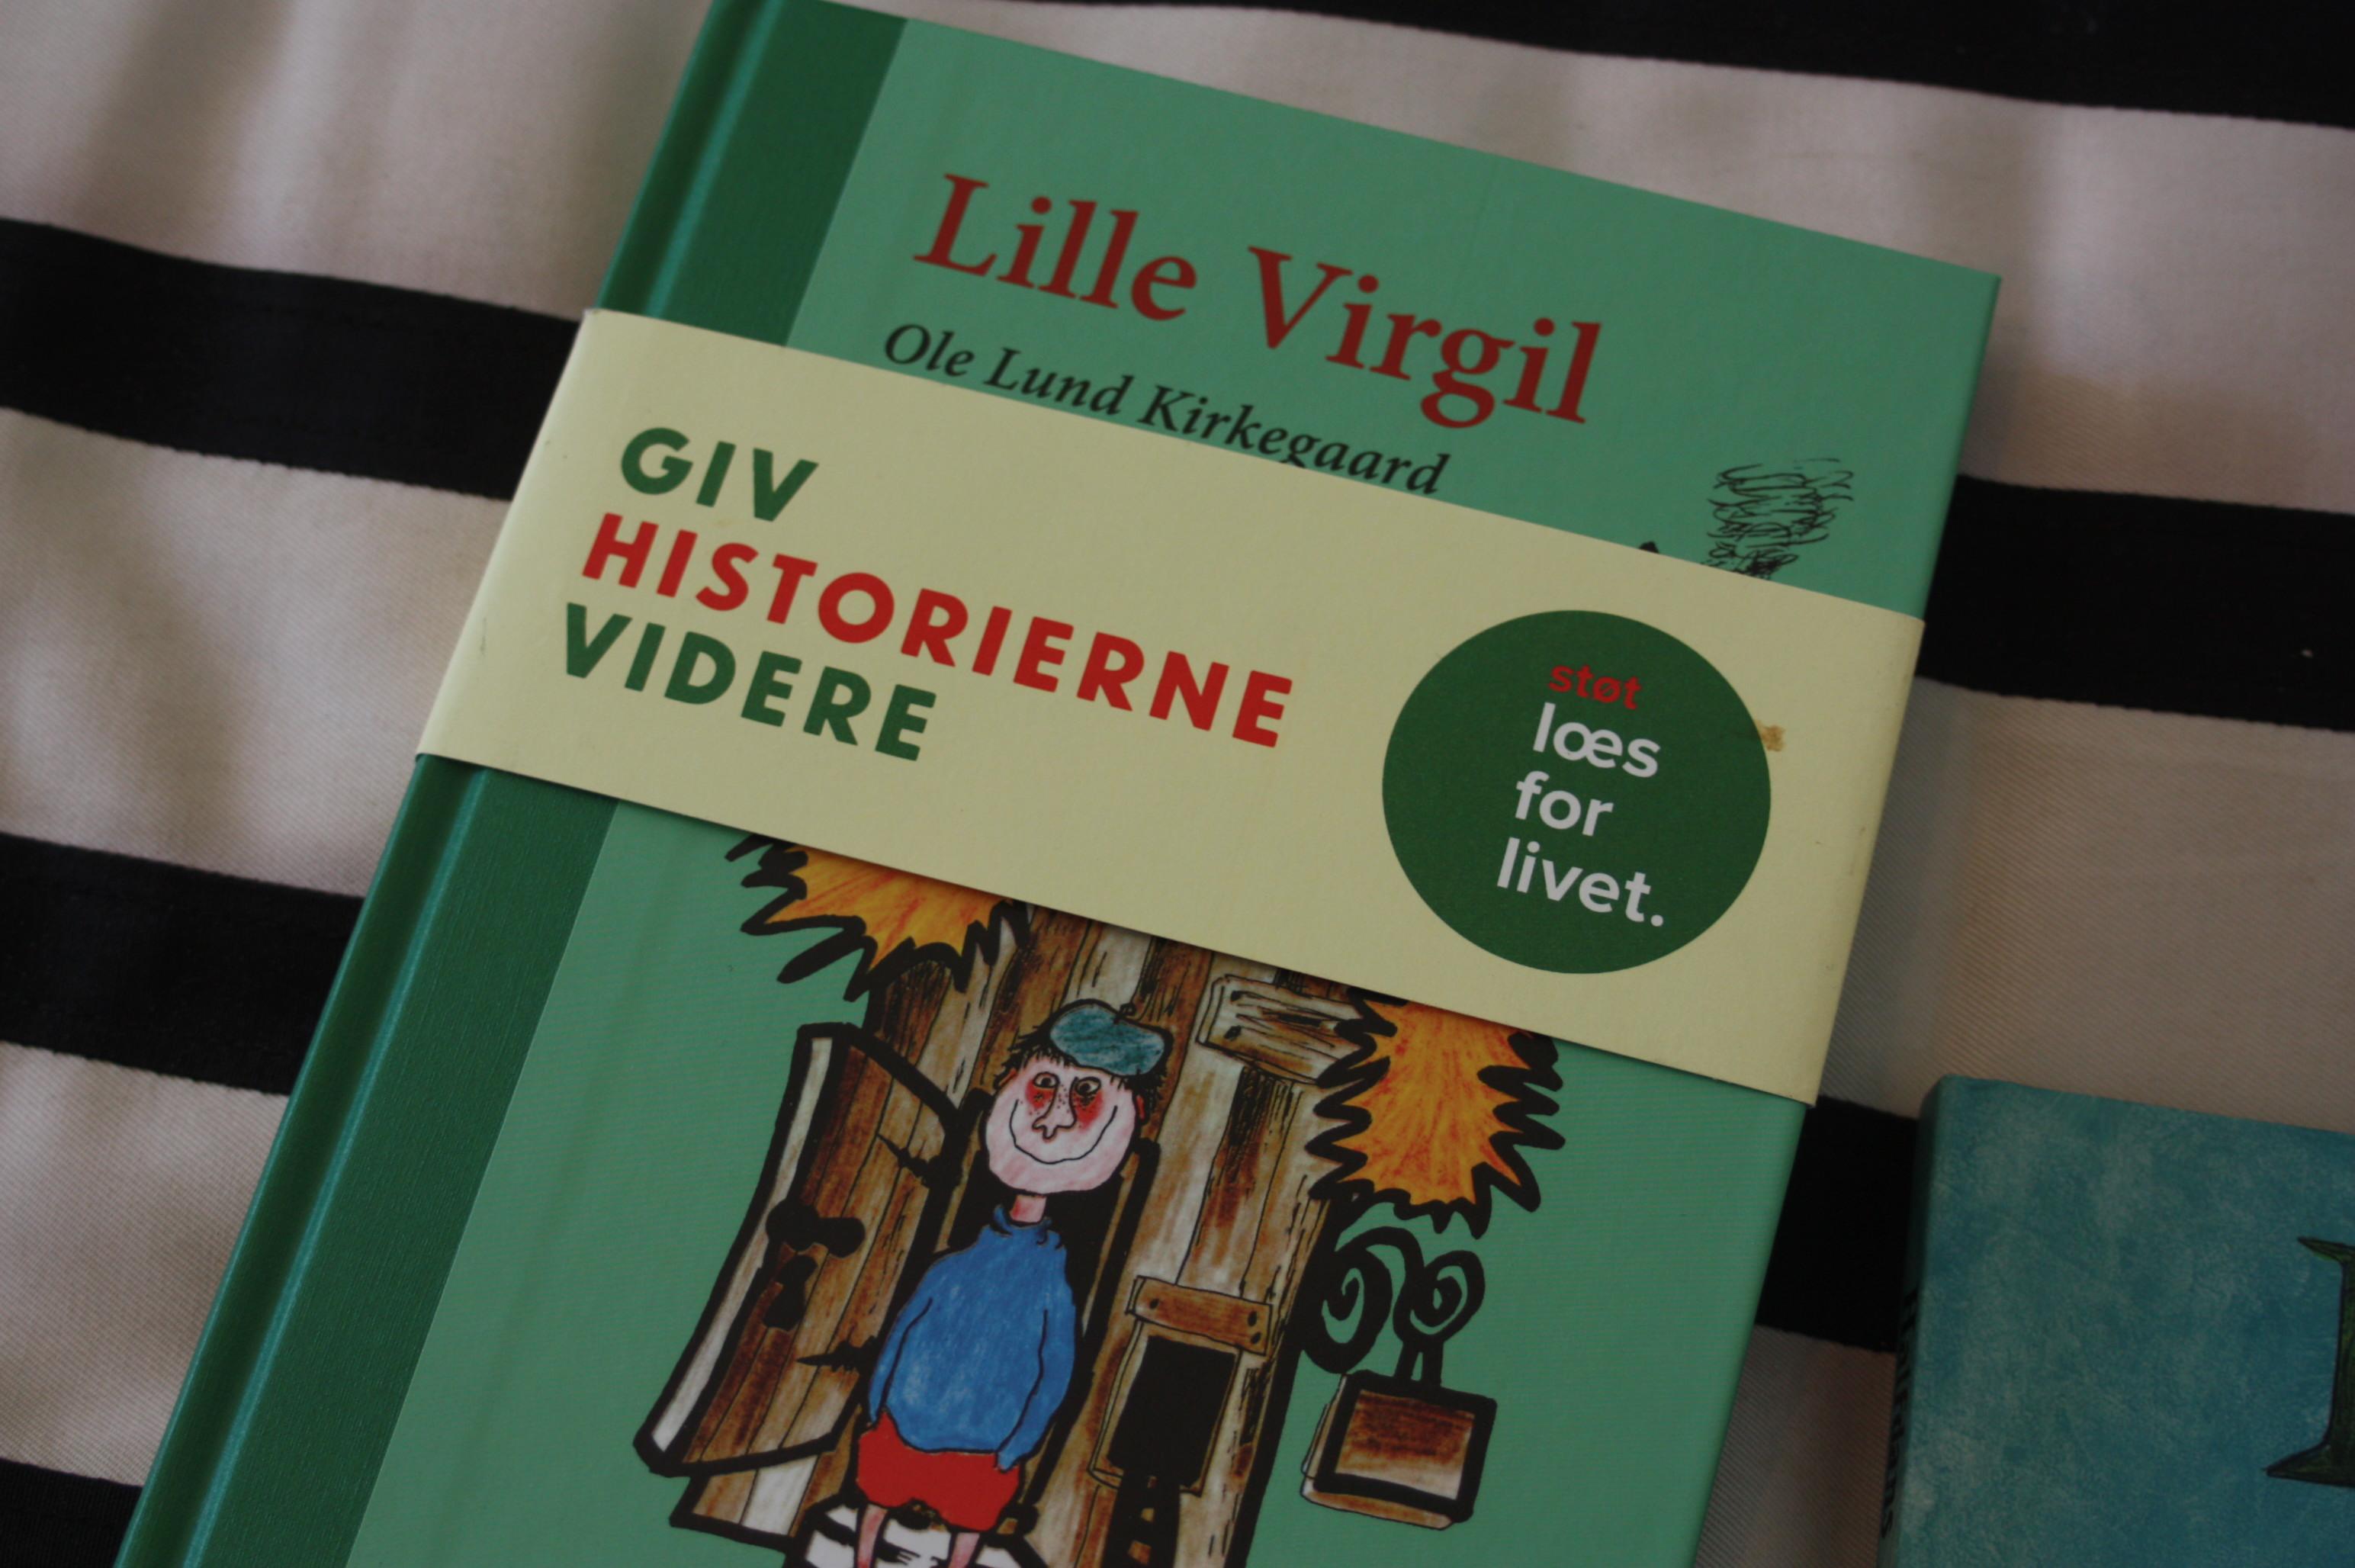 Lille Virgil